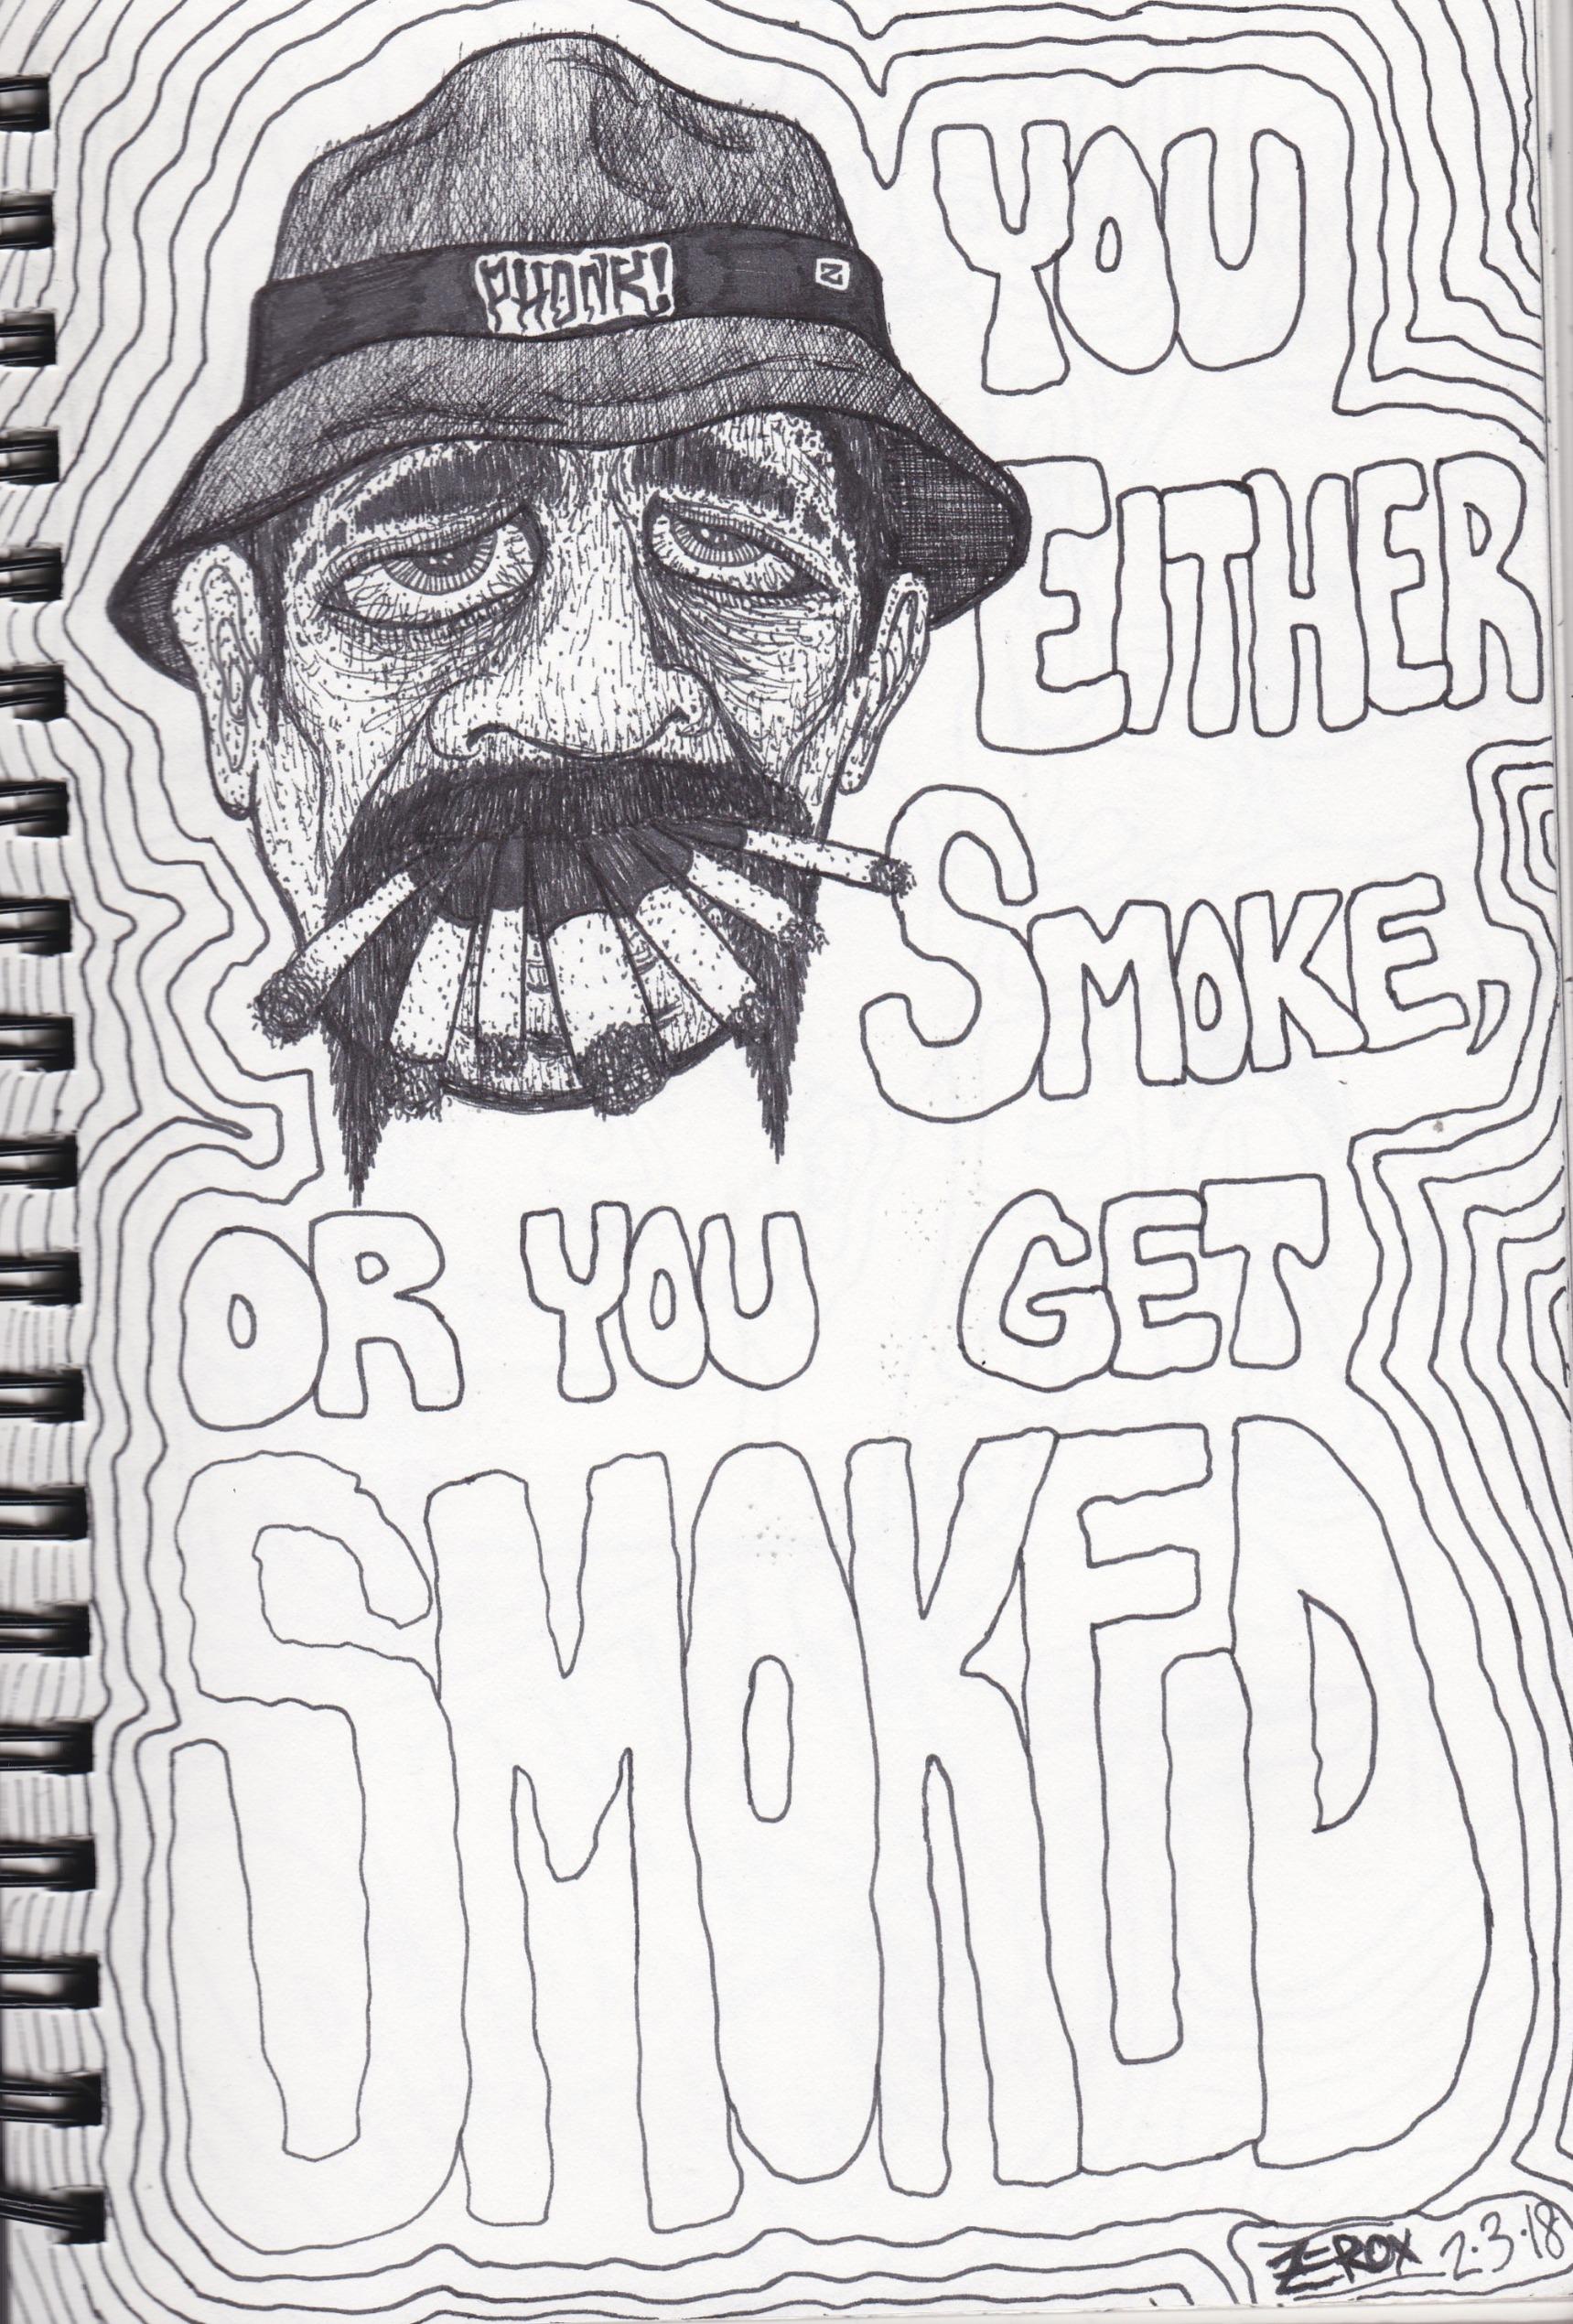 Smoke or get Smoked